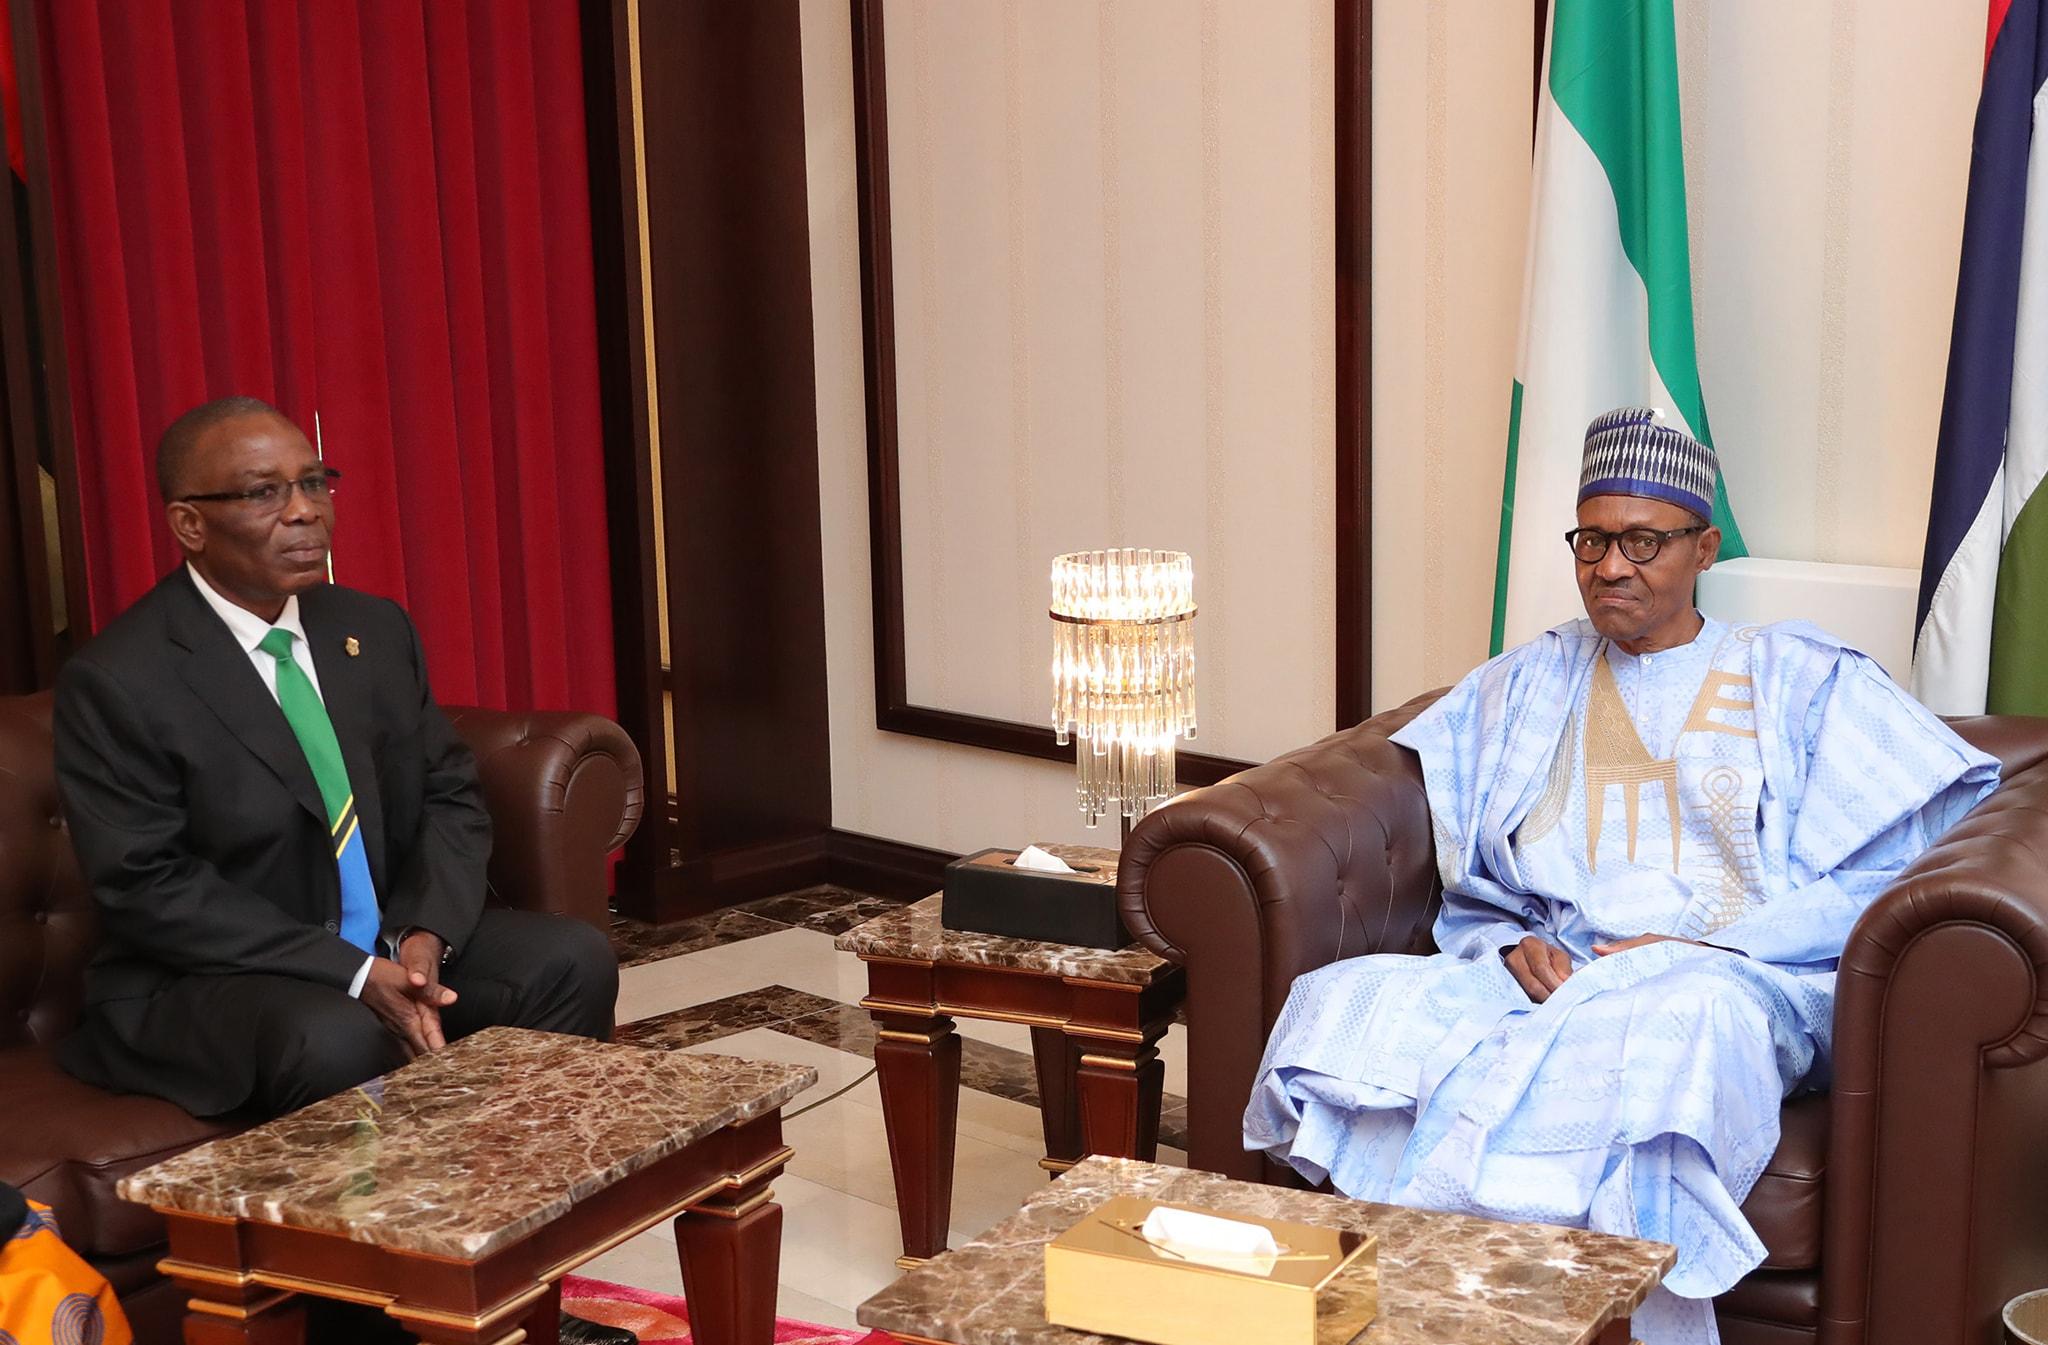 Nigeria To Boost Economic Relations With Tanzania - President Buhari Assures